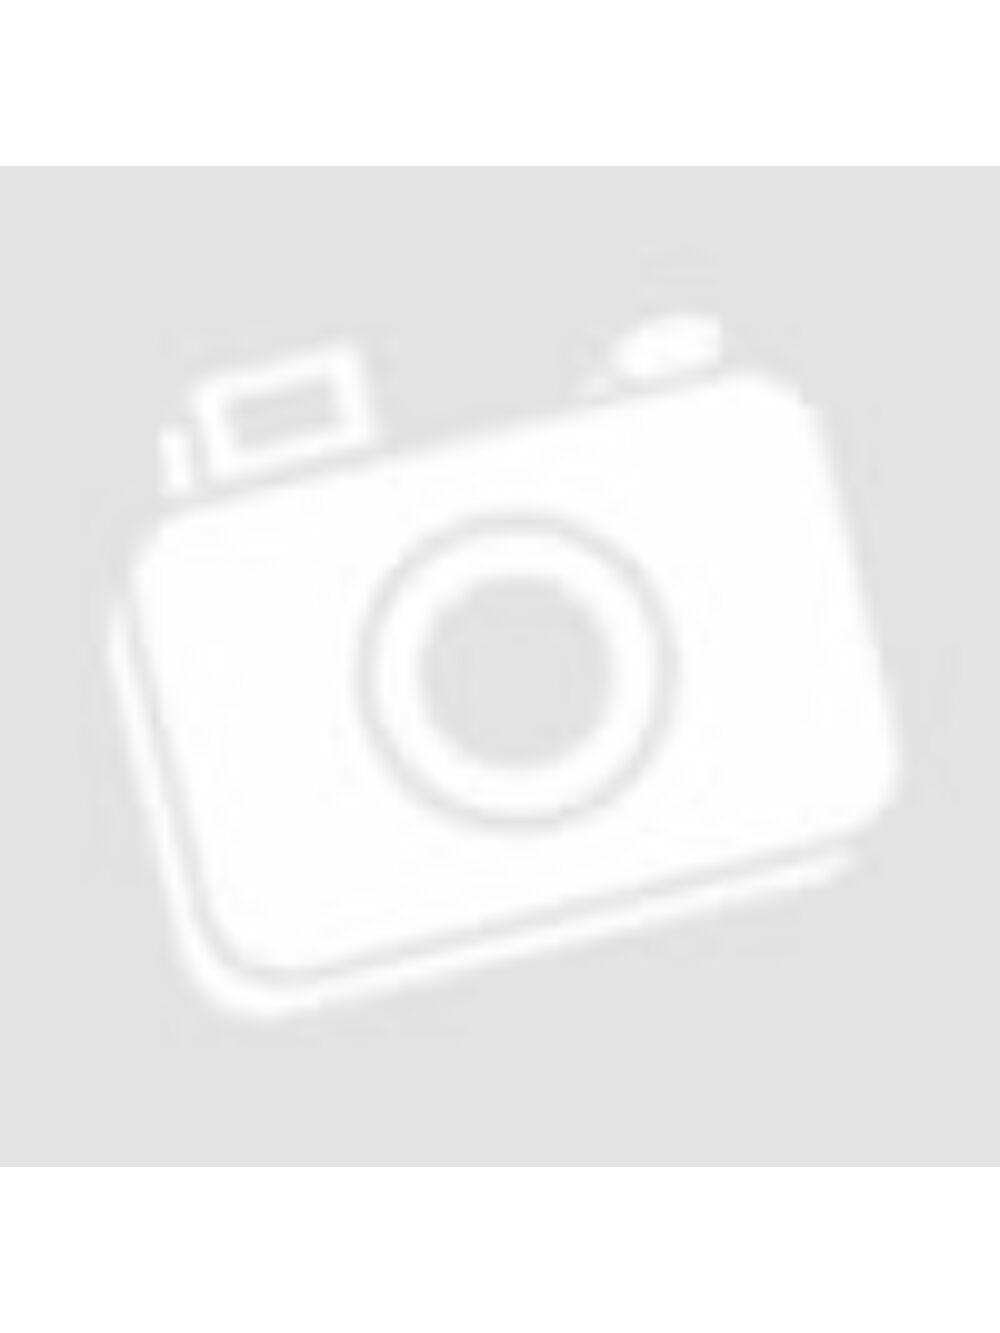 Lepke betűző NATURE*6 - Fehér